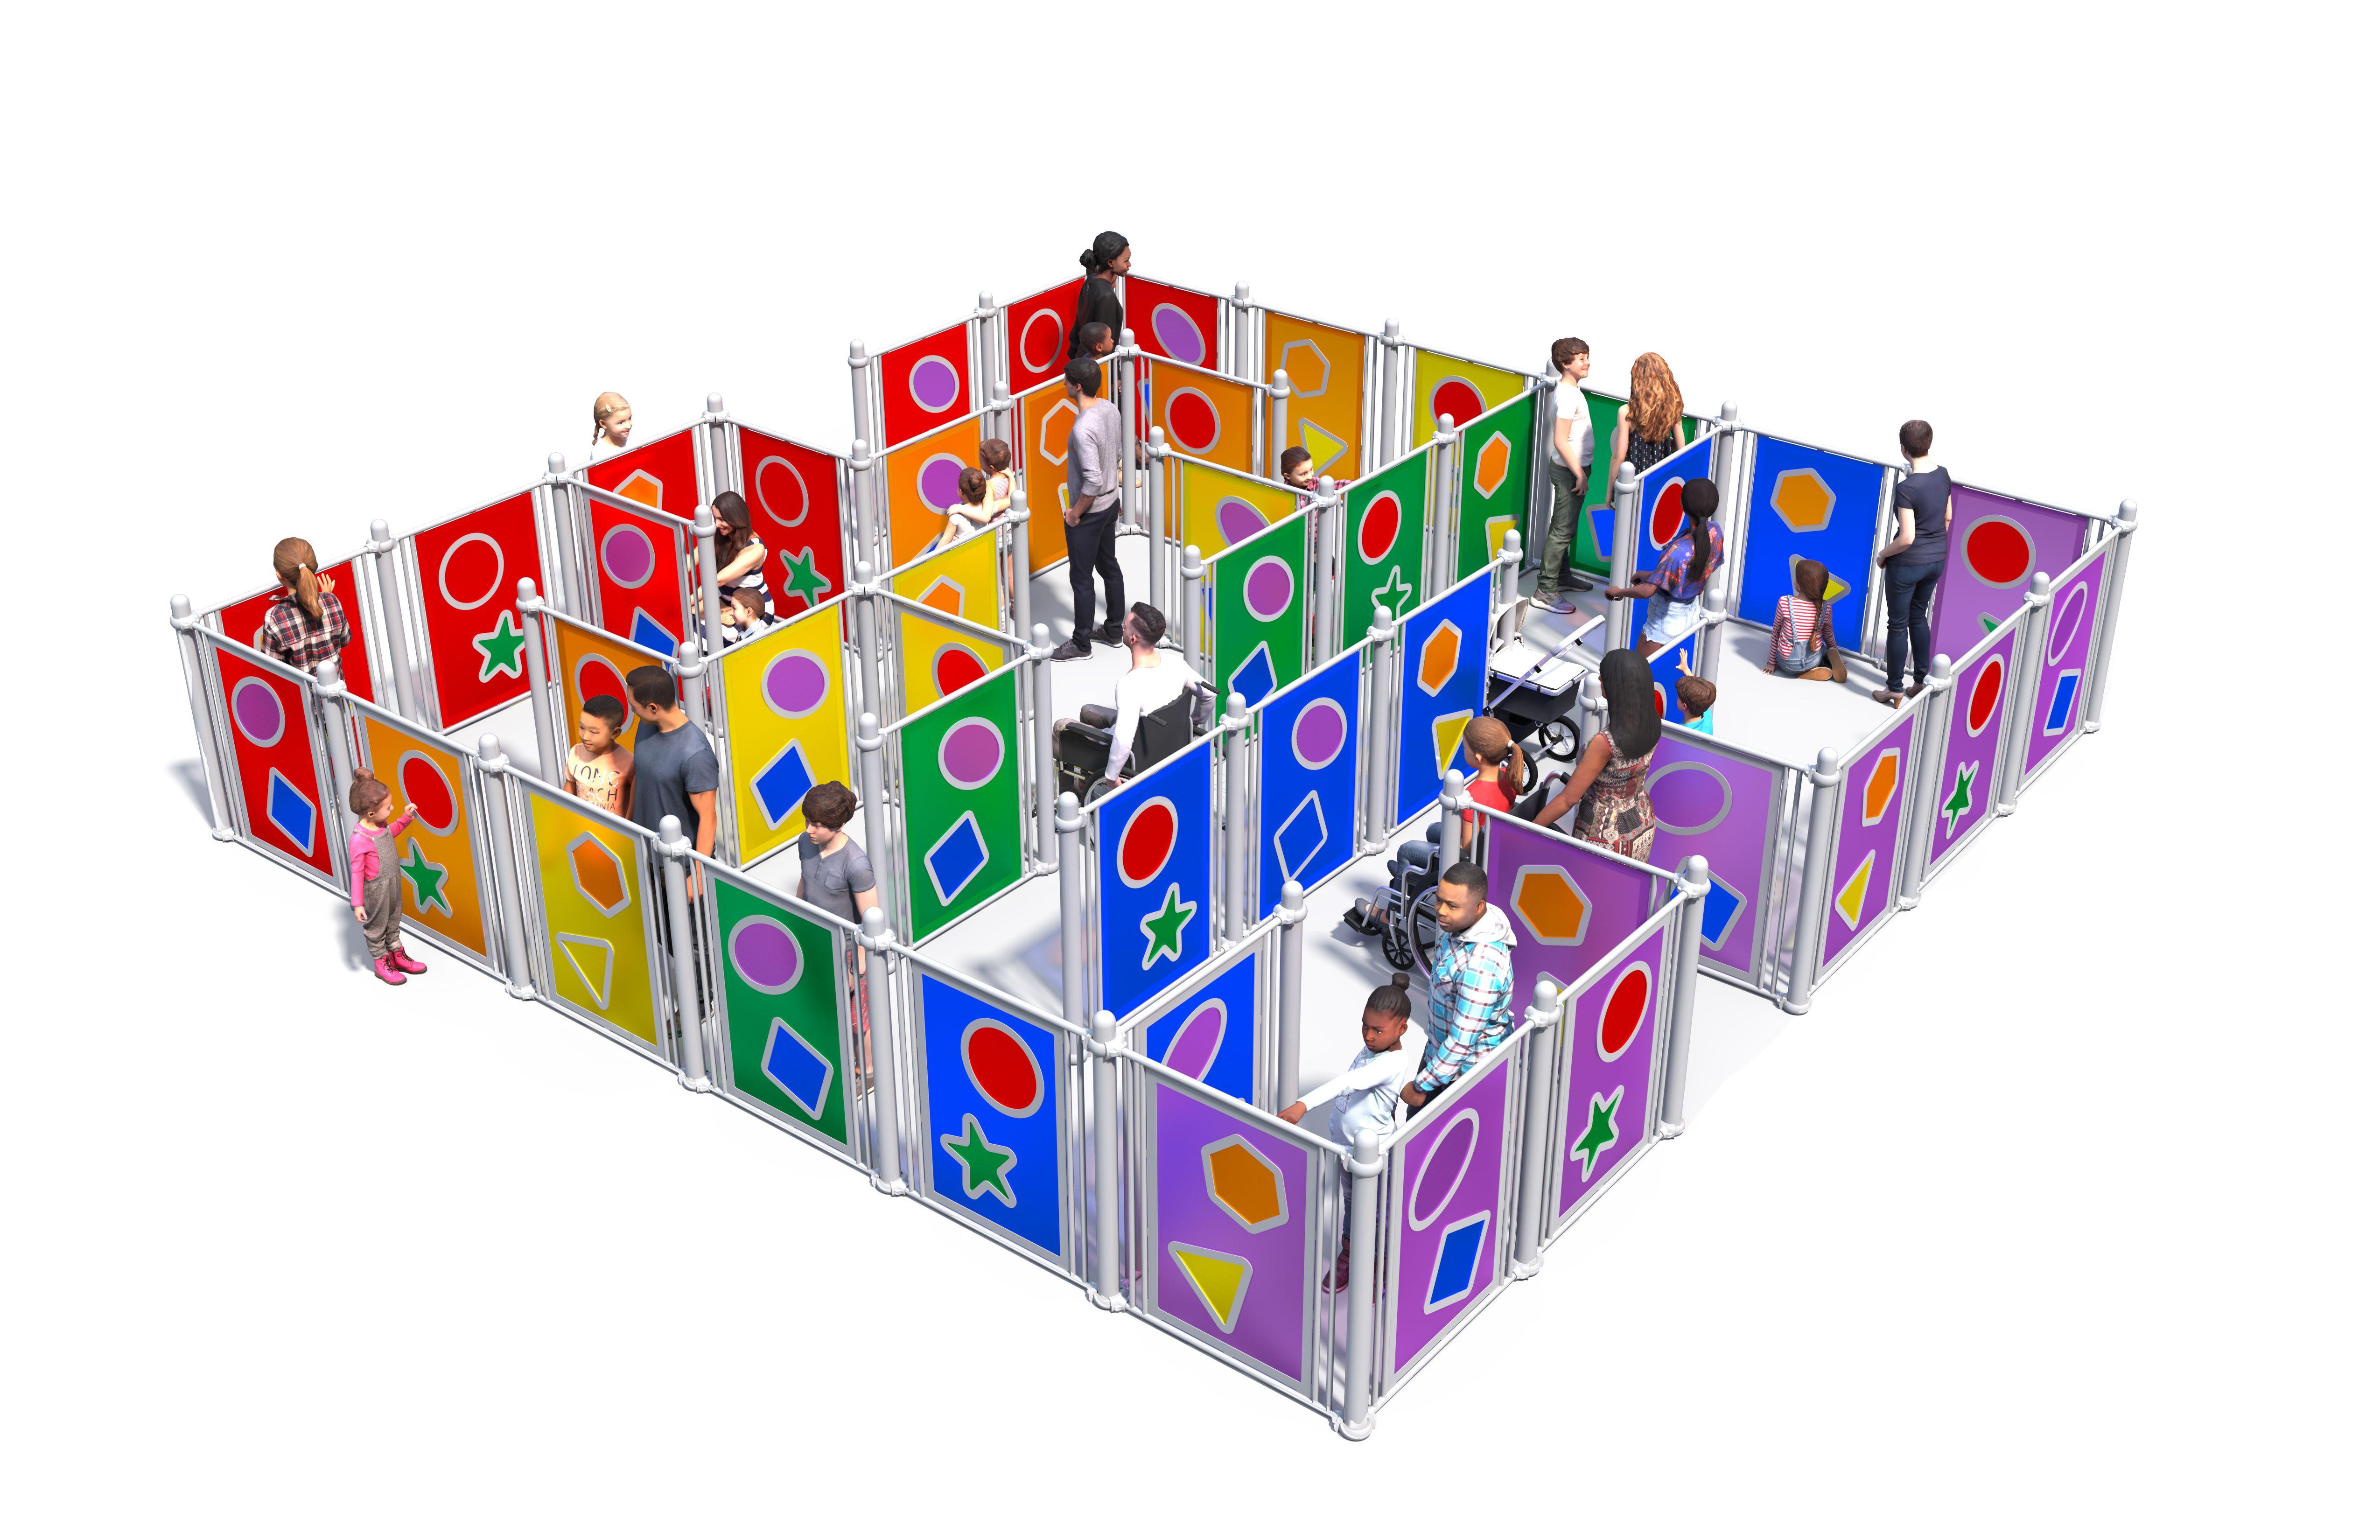 Sensory Maze - Large Maze